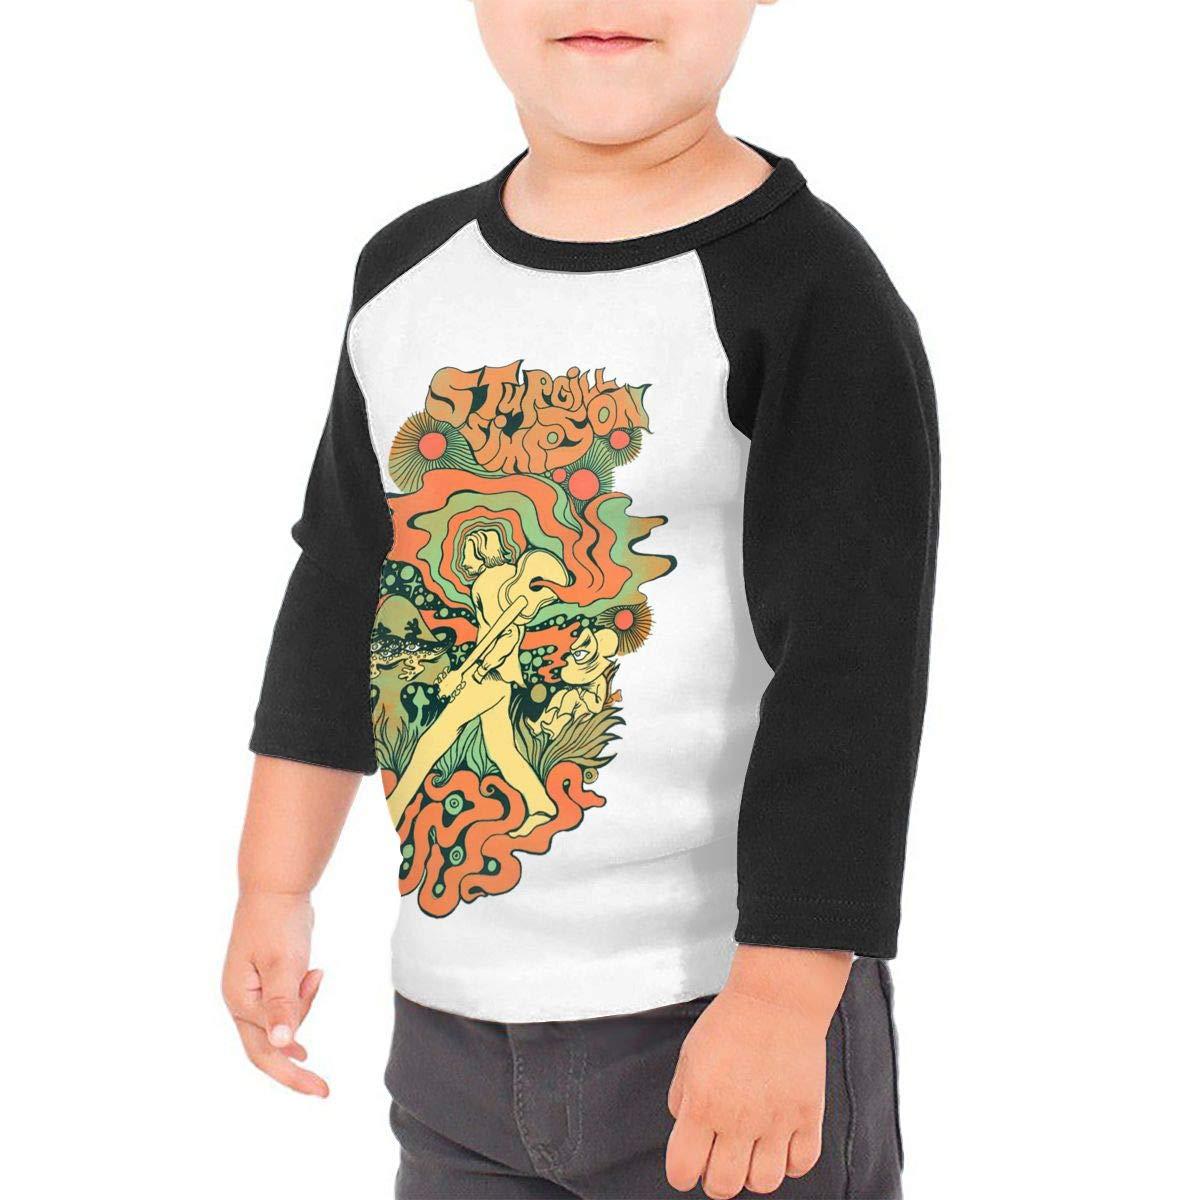 YUIf Kids T Shirts Sturgill Simpson Funny Cotton 3//4 Sleeve Baseball Tee Unisex